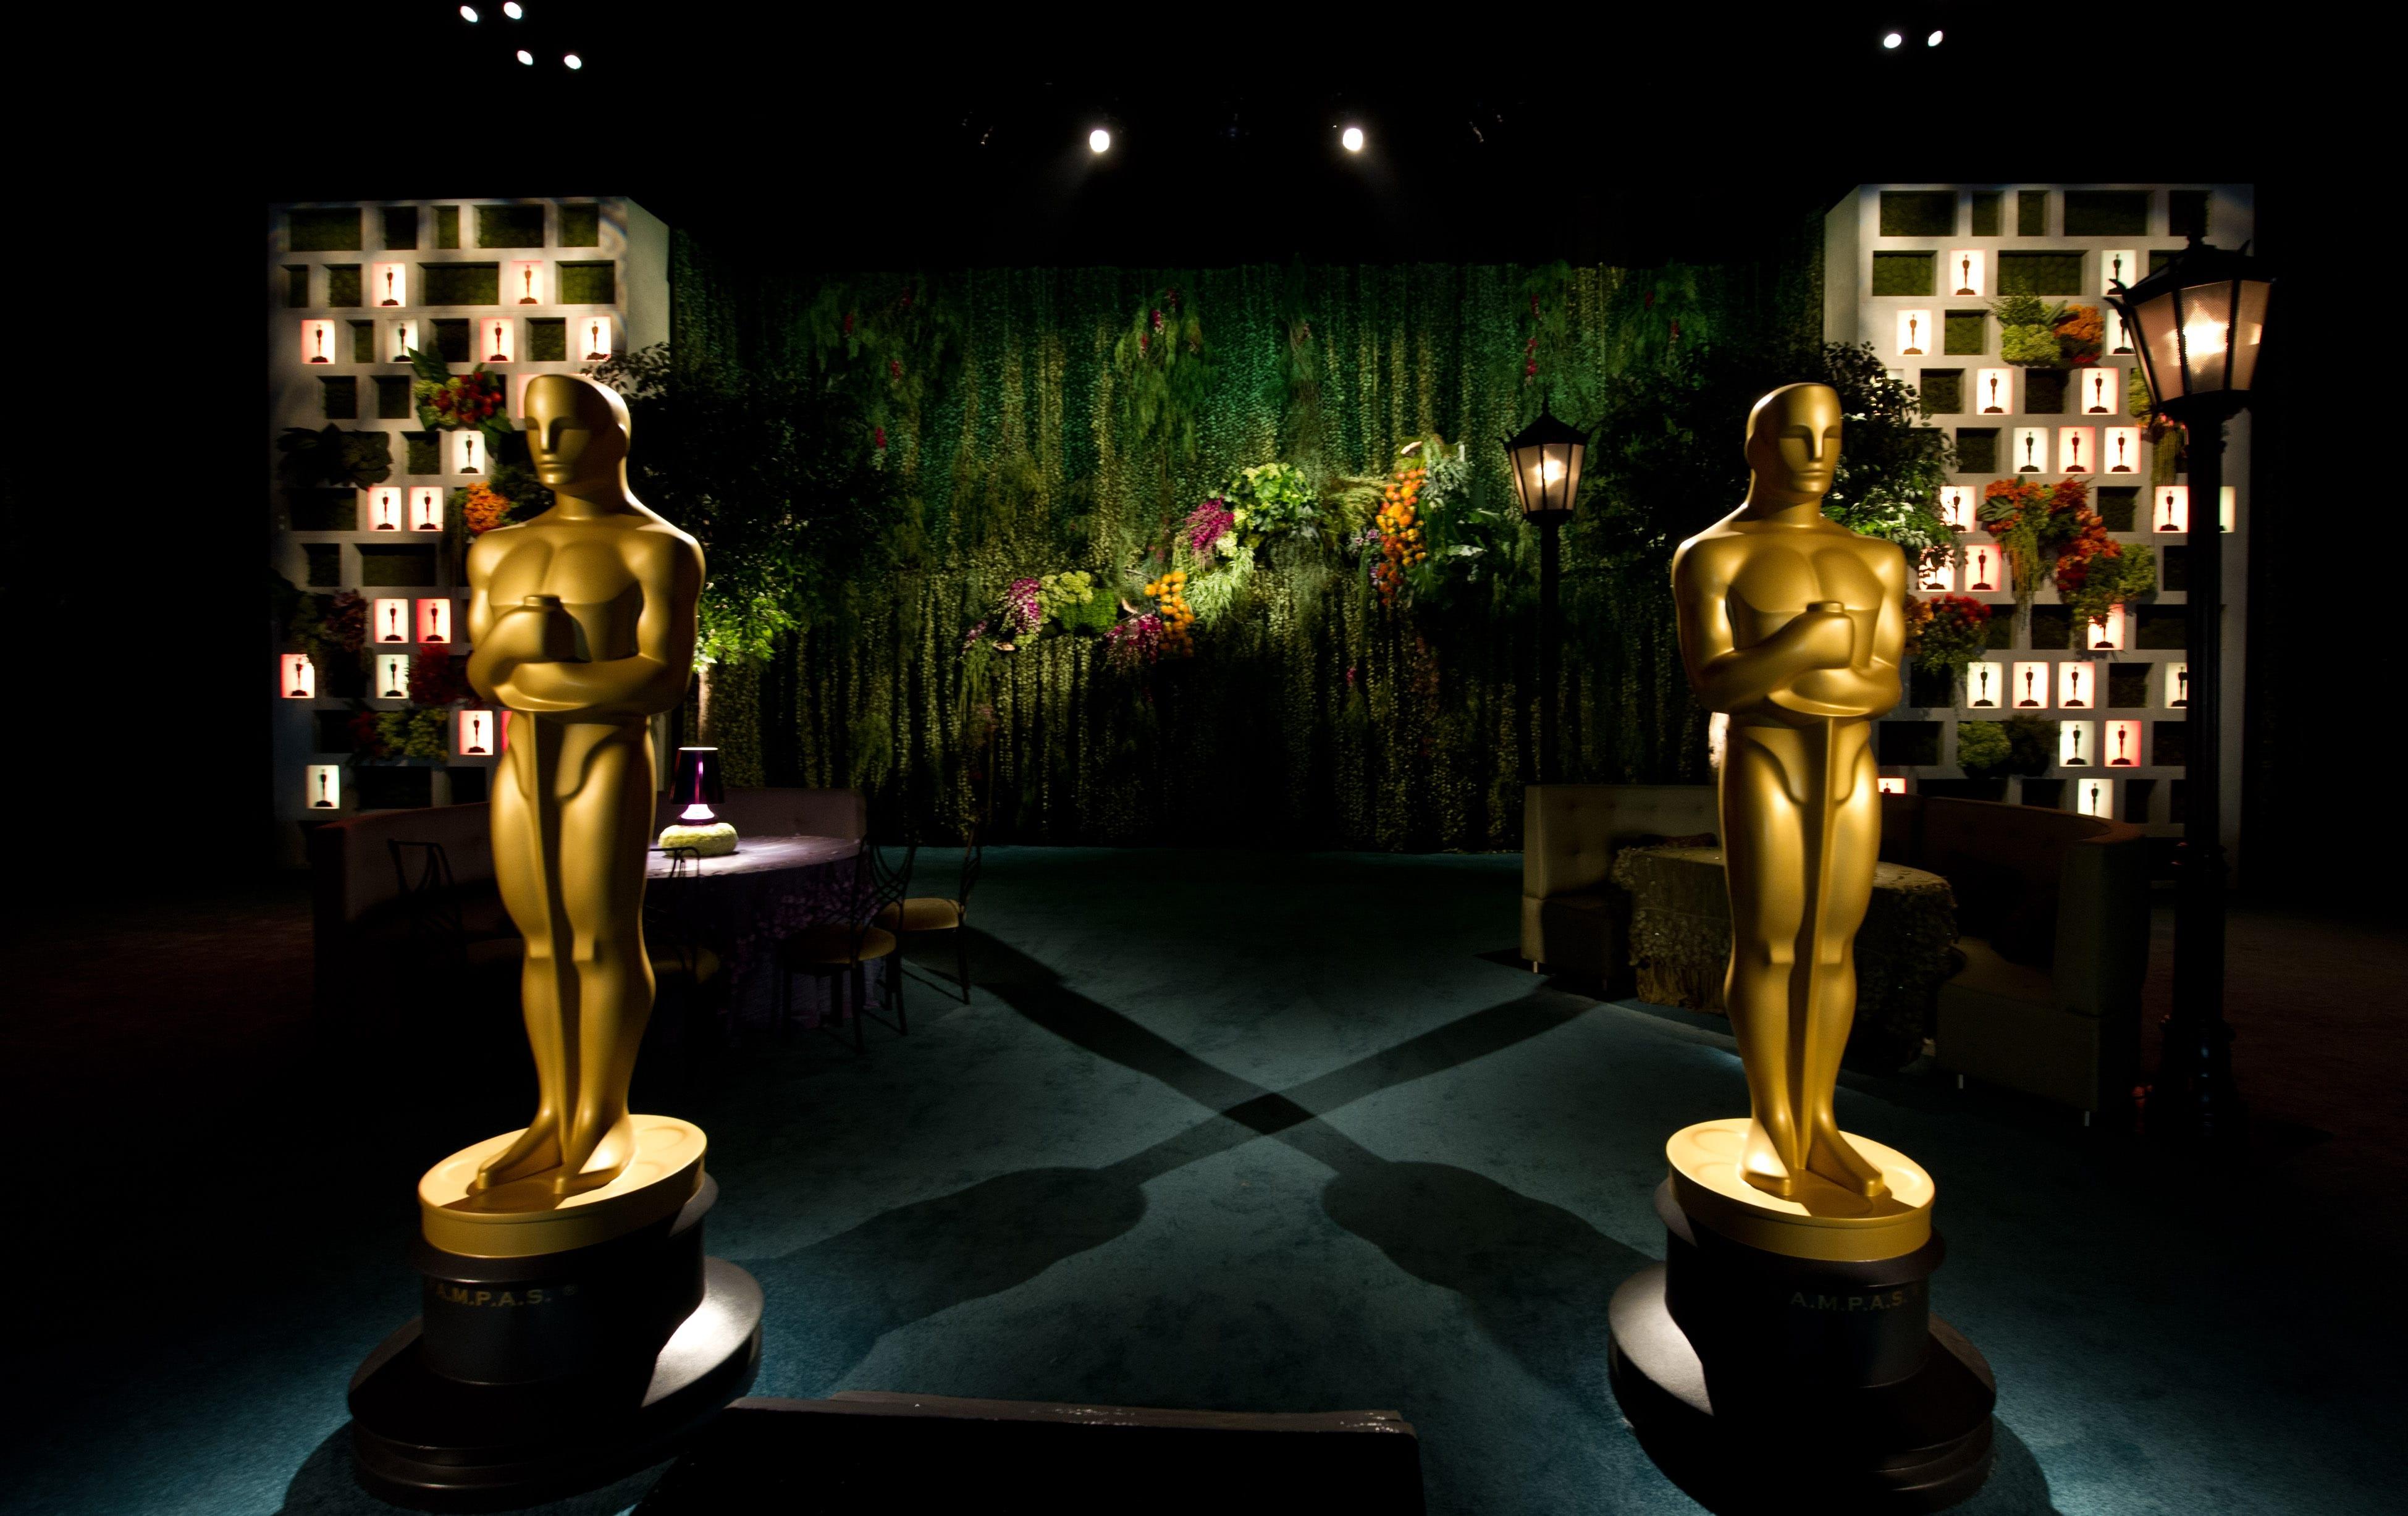 The academy awards 2014 inside film for Award ceremony decoration ideas